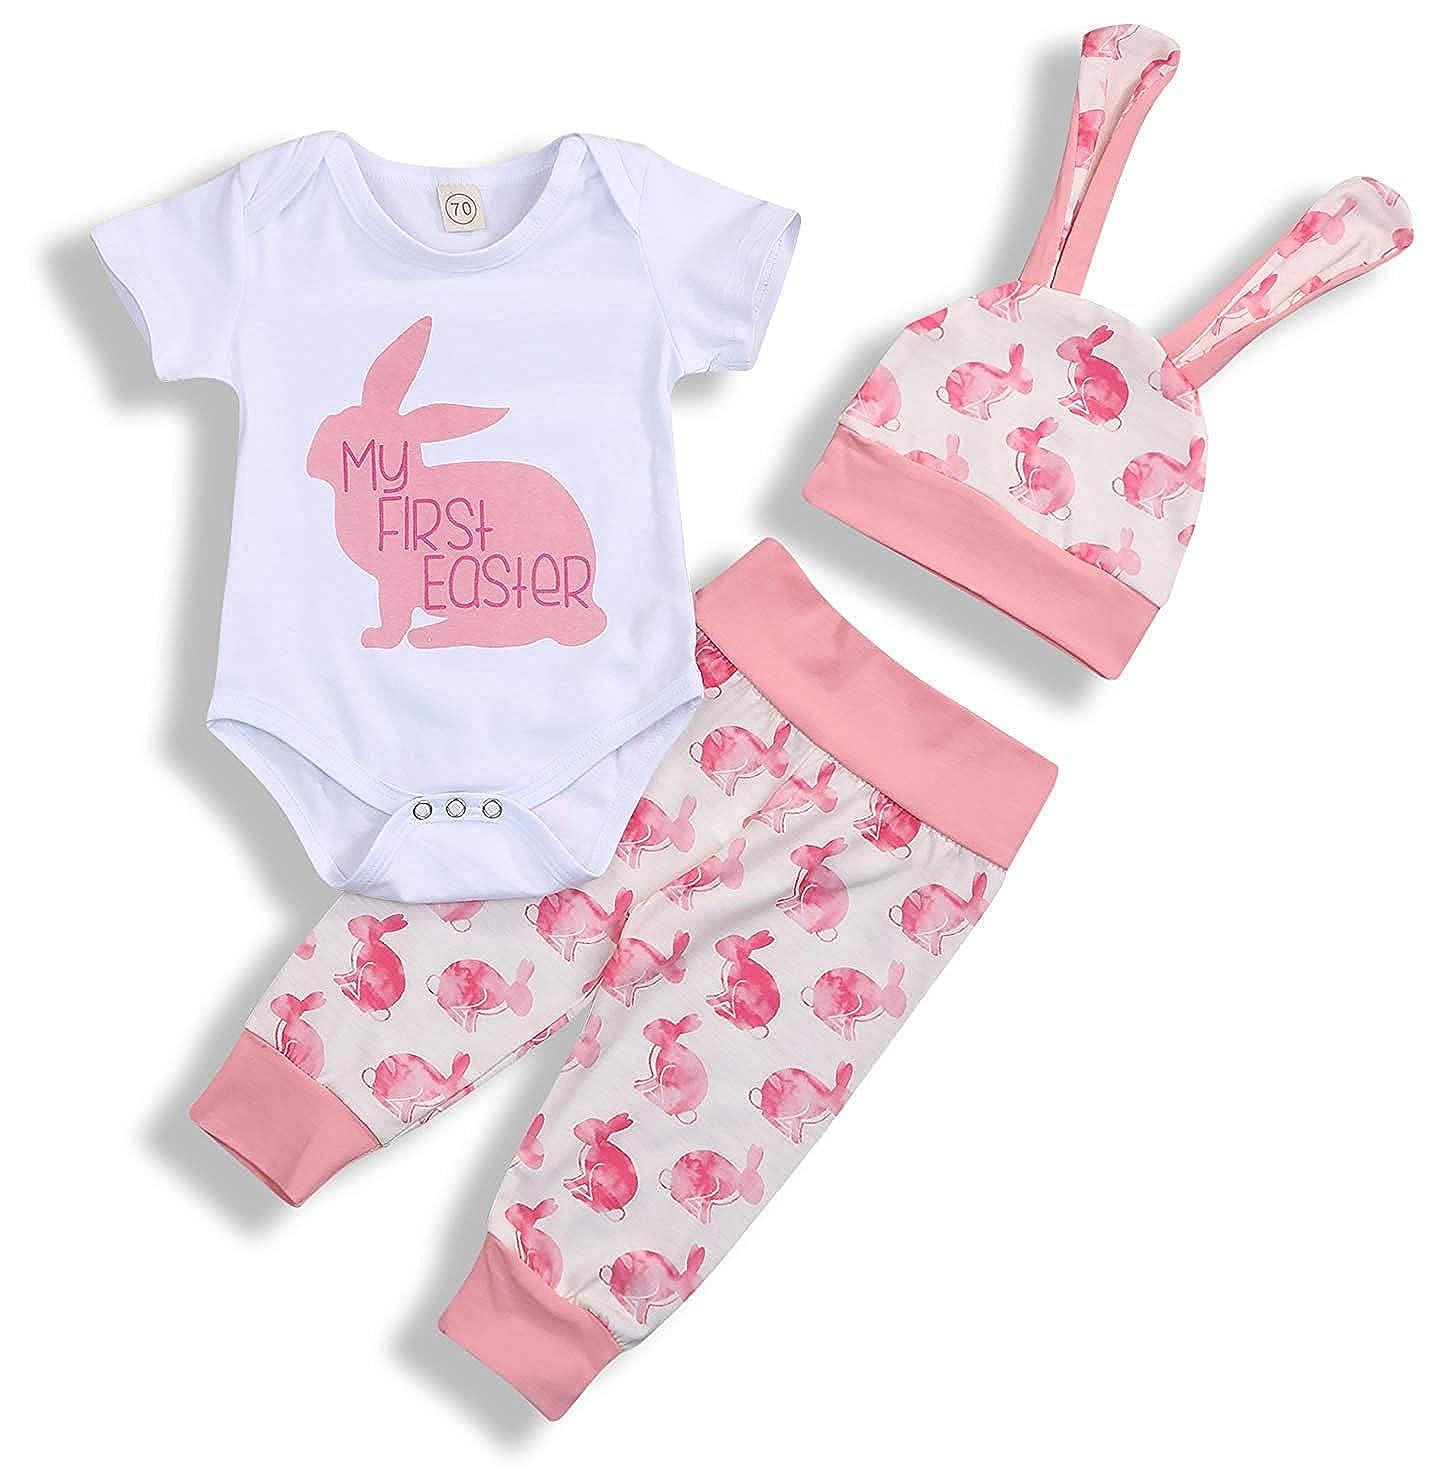 86785e57d3c62 My 1st Easter Newborn Baby Boy Girl Outfits Rabbit Romper Top+Cartoon 3D  Bunny Ears Hat+Cute Pant 3Pcs Twins Clothes Set